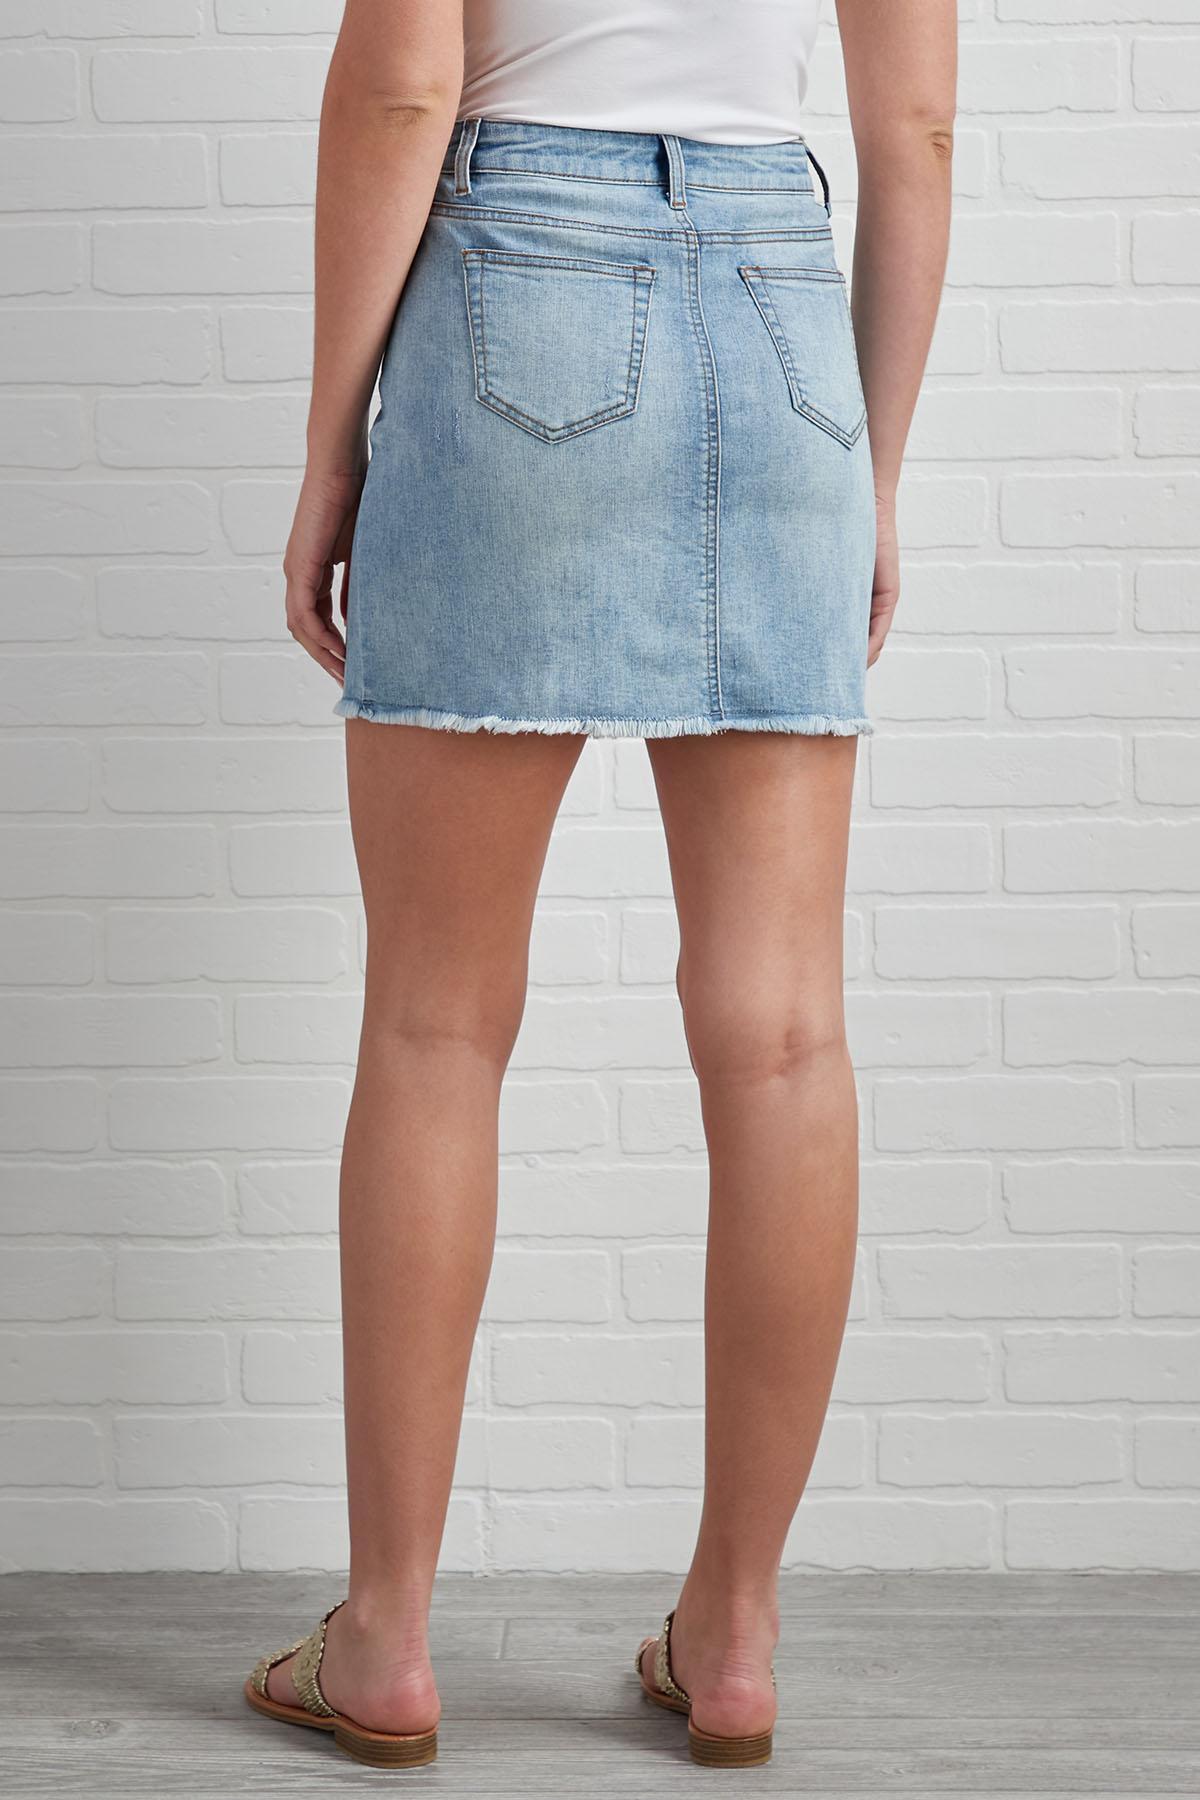 Miss Americana Skirt